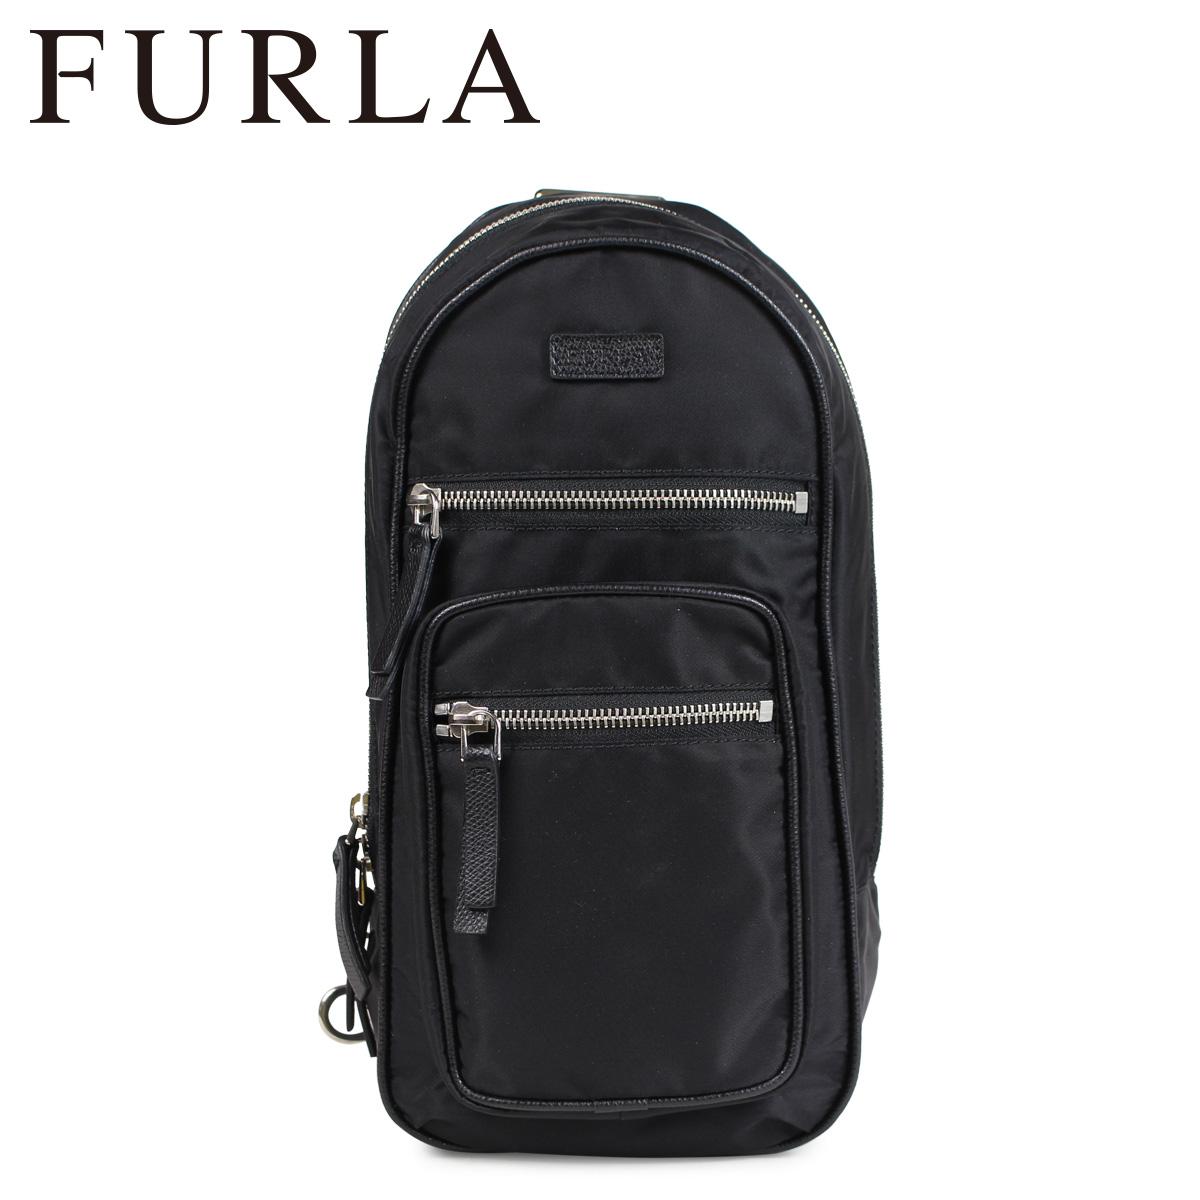 FURLA フルラ バッグ ショルダーバッグ ワンショルダー メンズ FENICE MENS CROSSBODY BAG ブラック 黒 798488